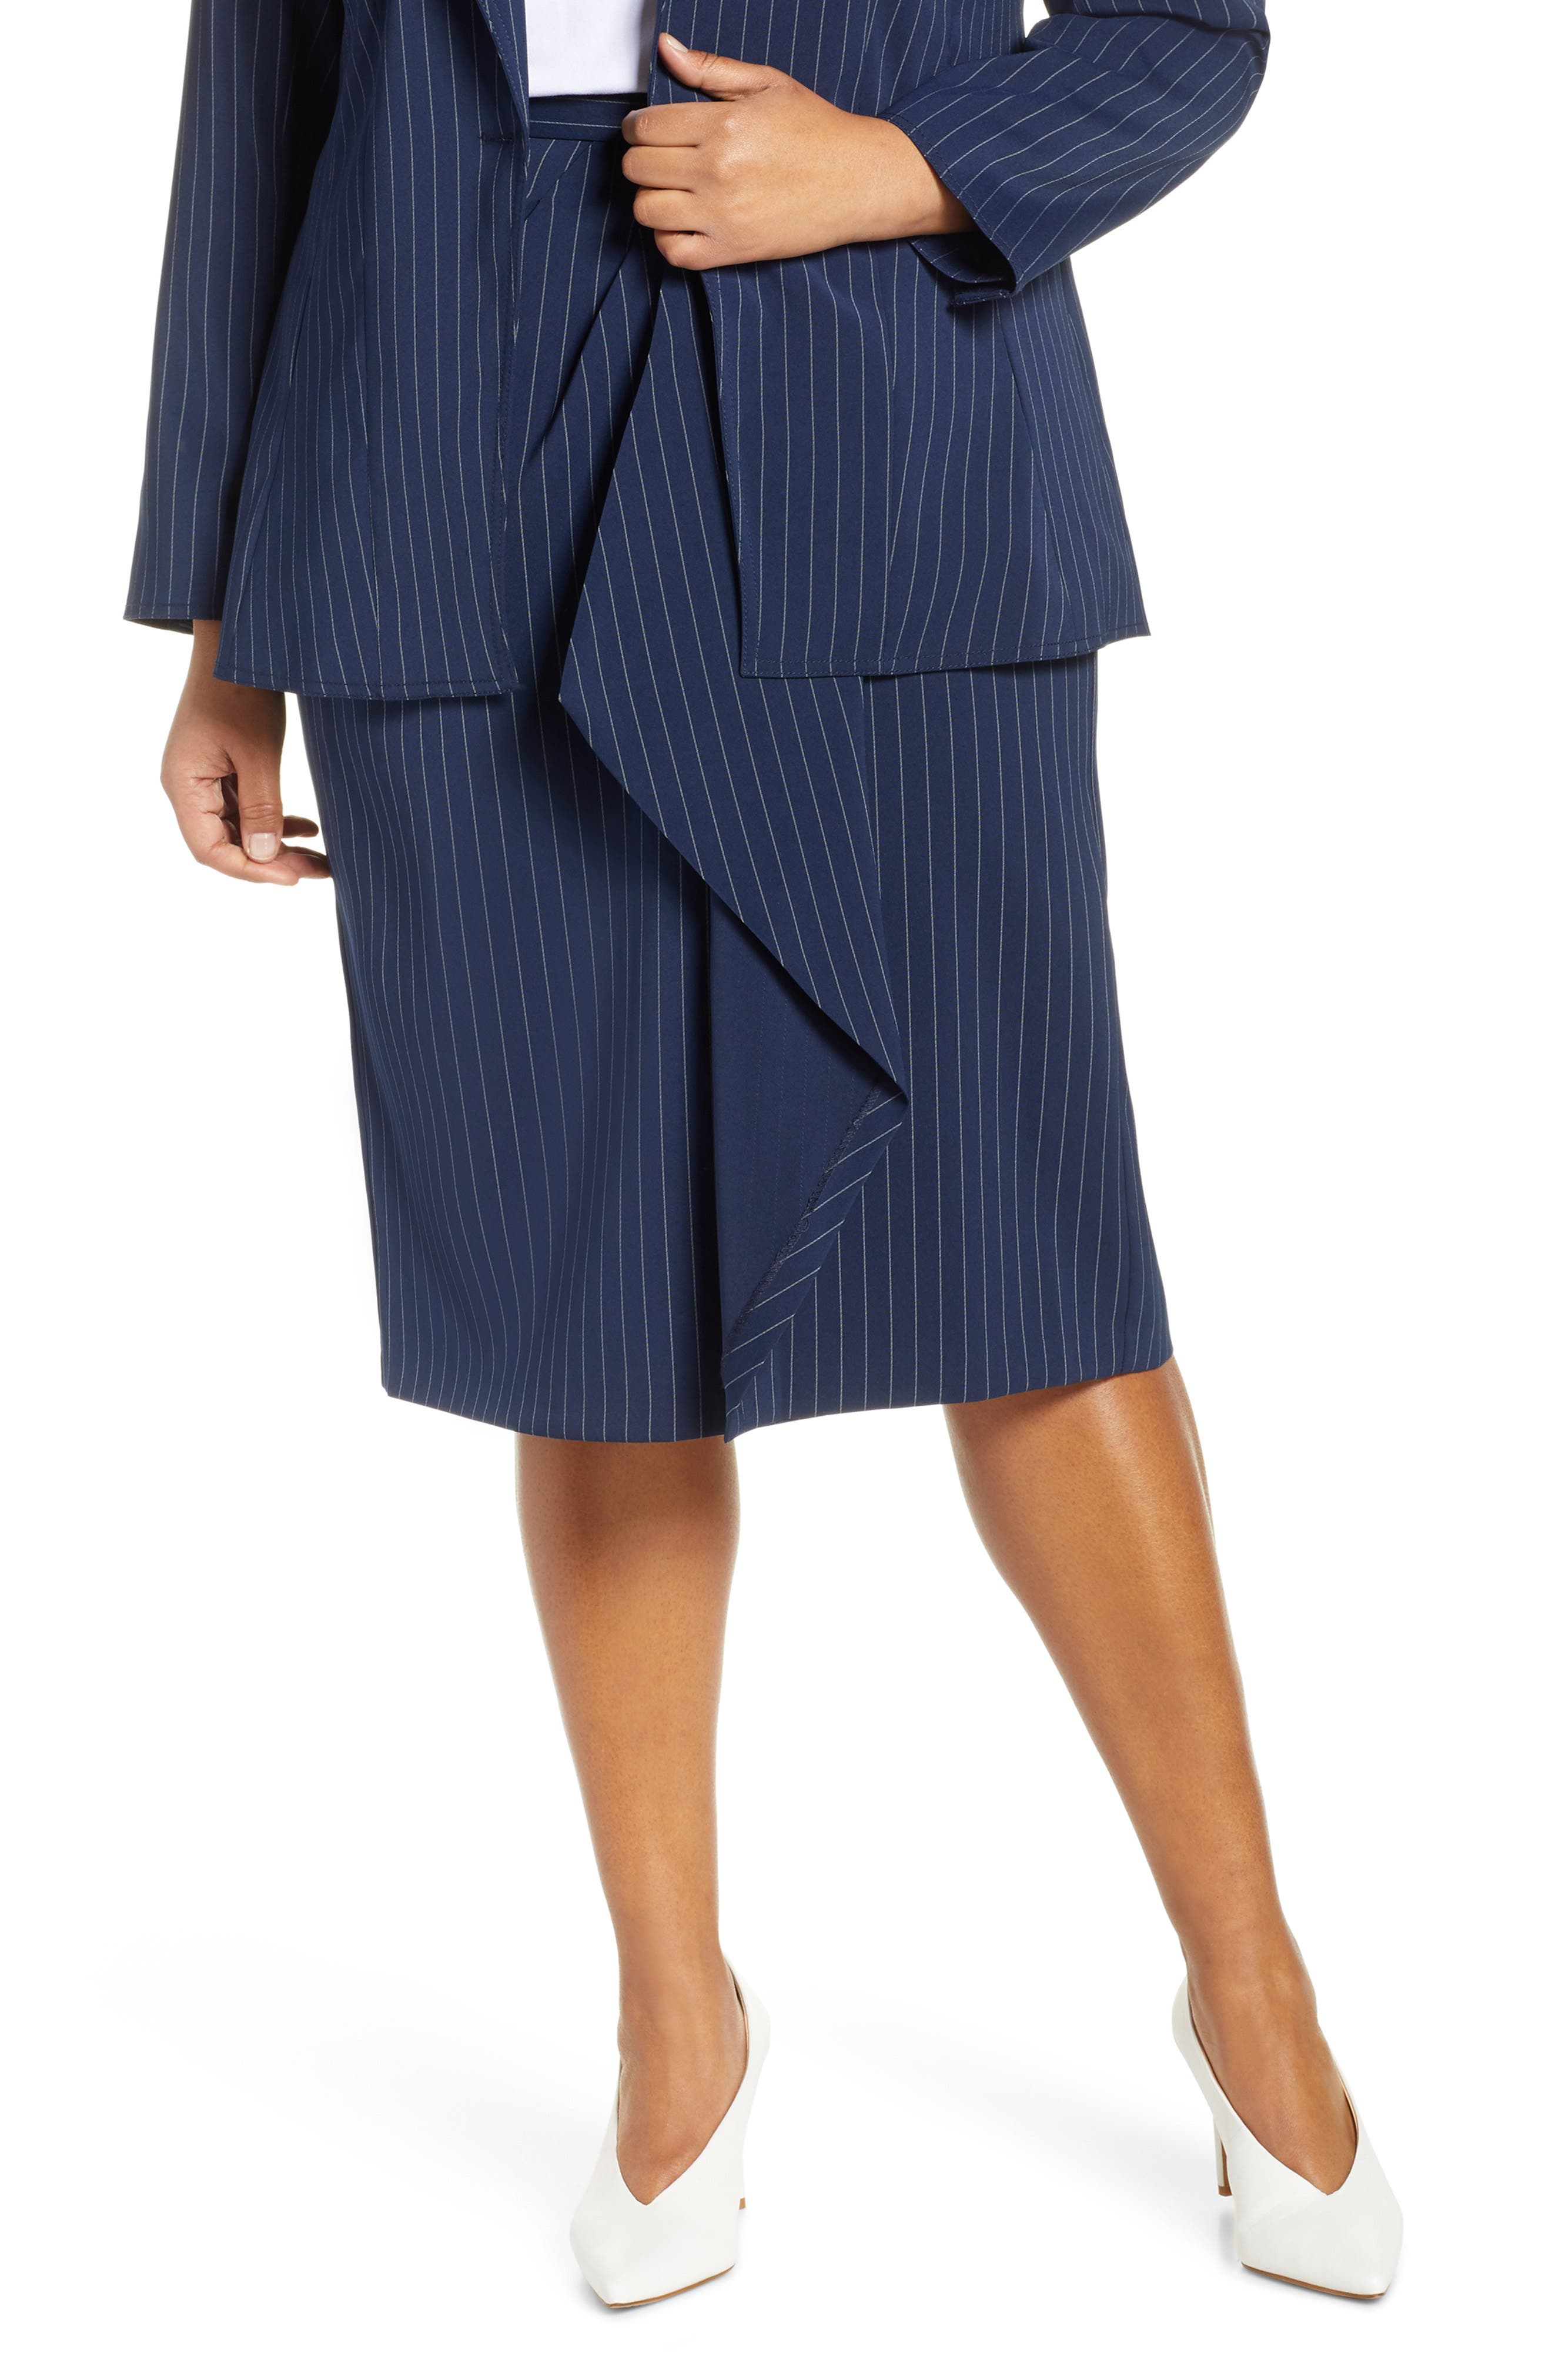 Plus Size Jason Wu X Eloquii Asymmetrical Drape Pencil Skirt, White